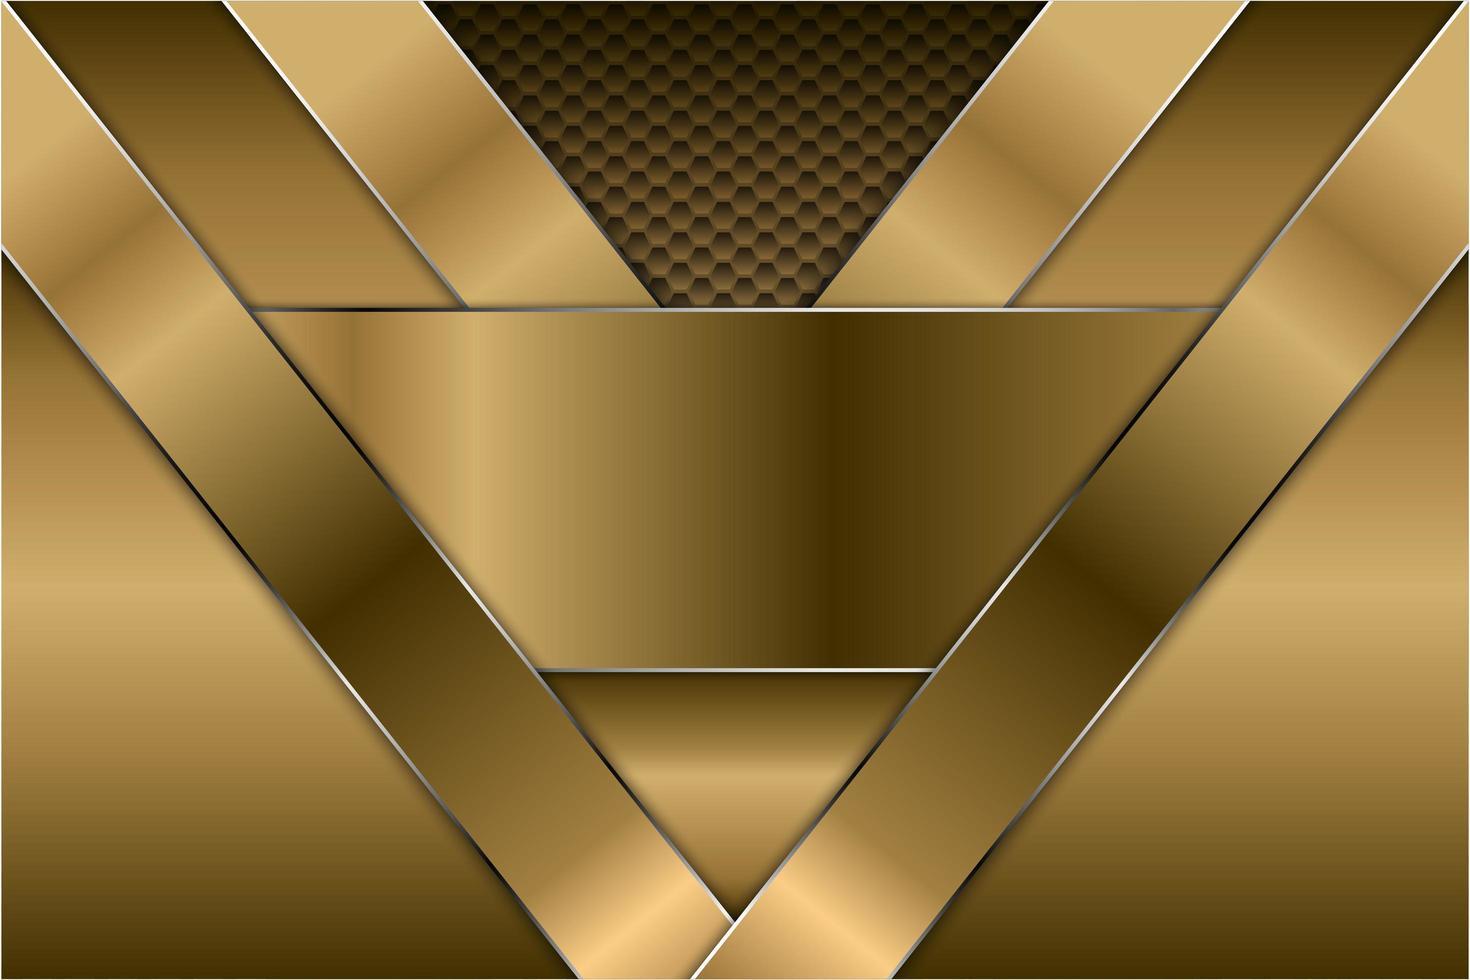 guldmetallisk bakgrund med hexagonmönster vektor